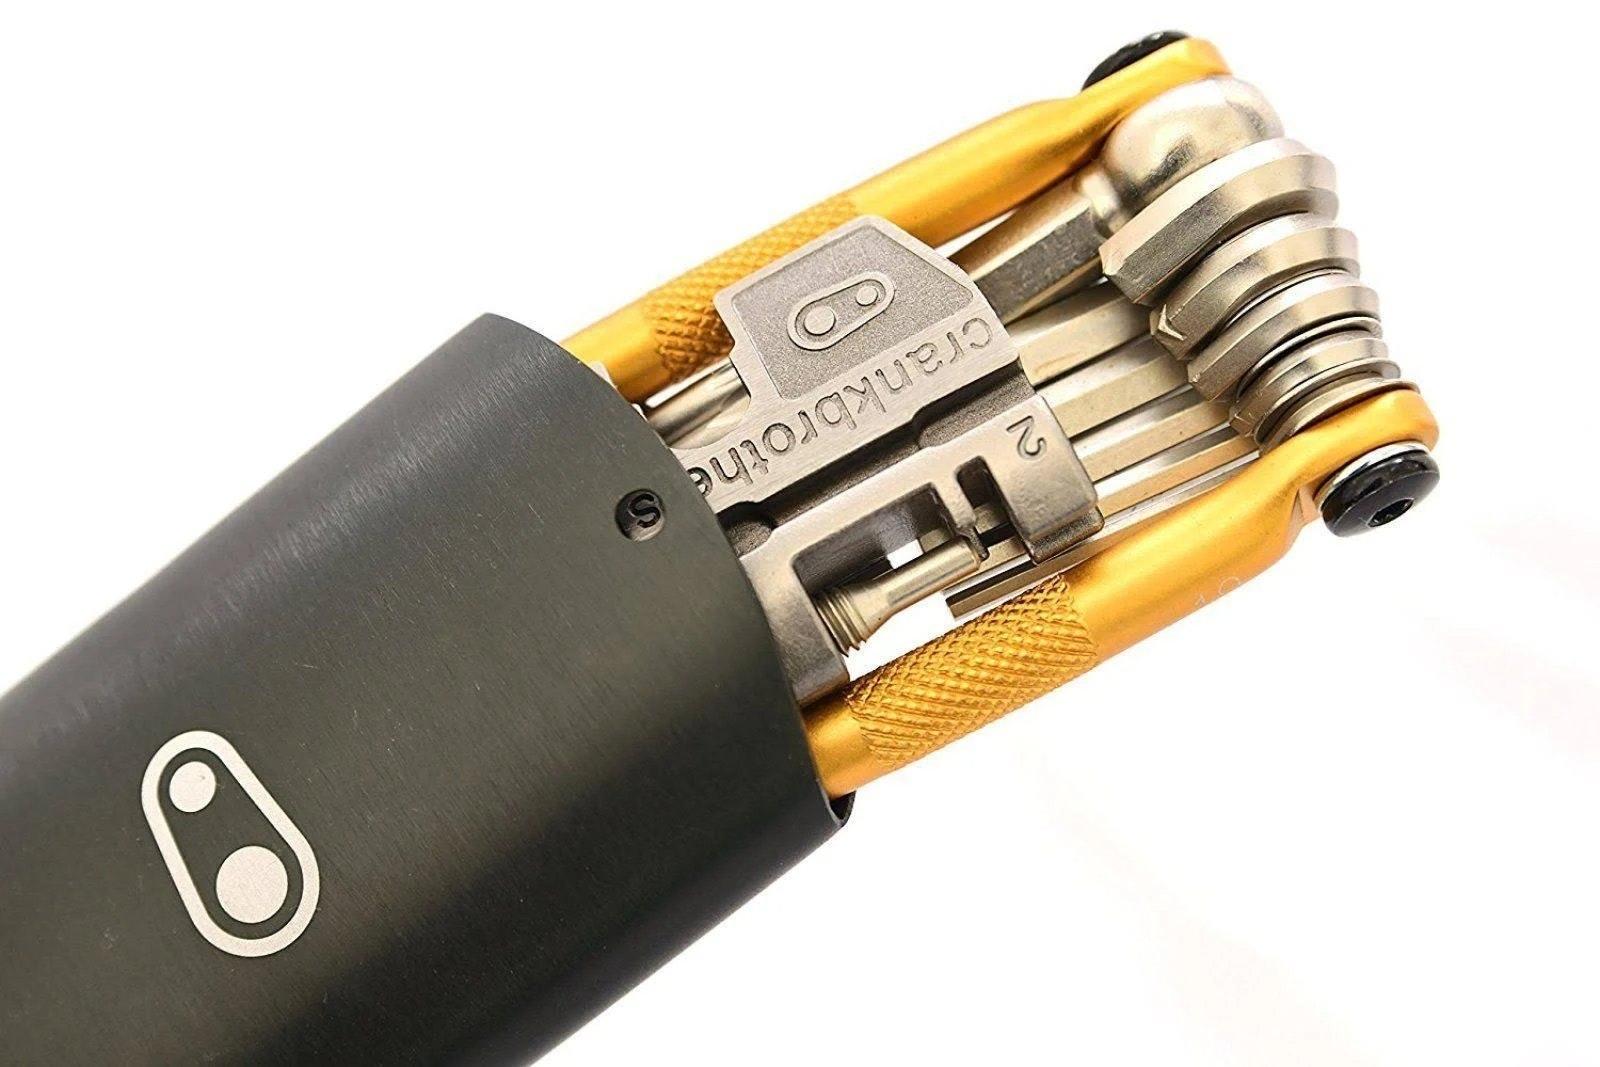 CrankBrothers M-19 Tool